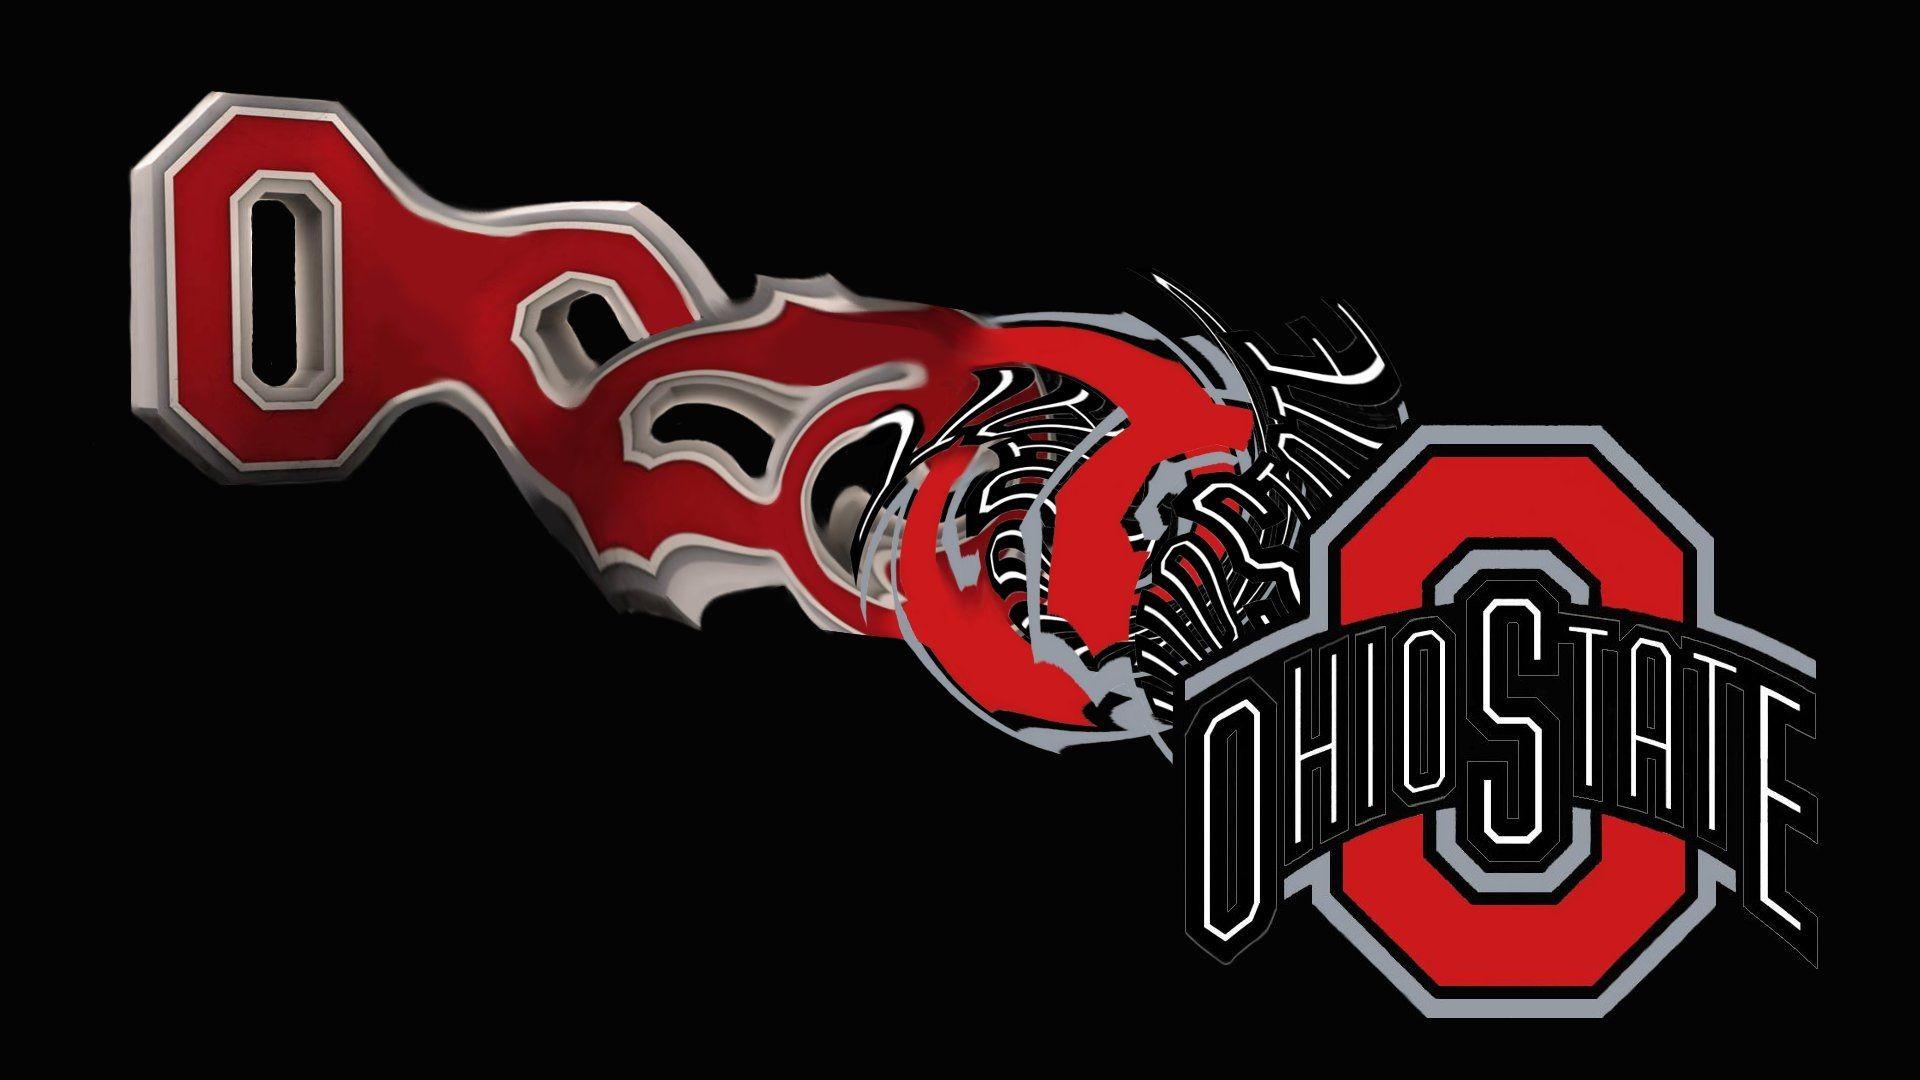 Ohio State Live Wallpaper: Image Source · Image Source